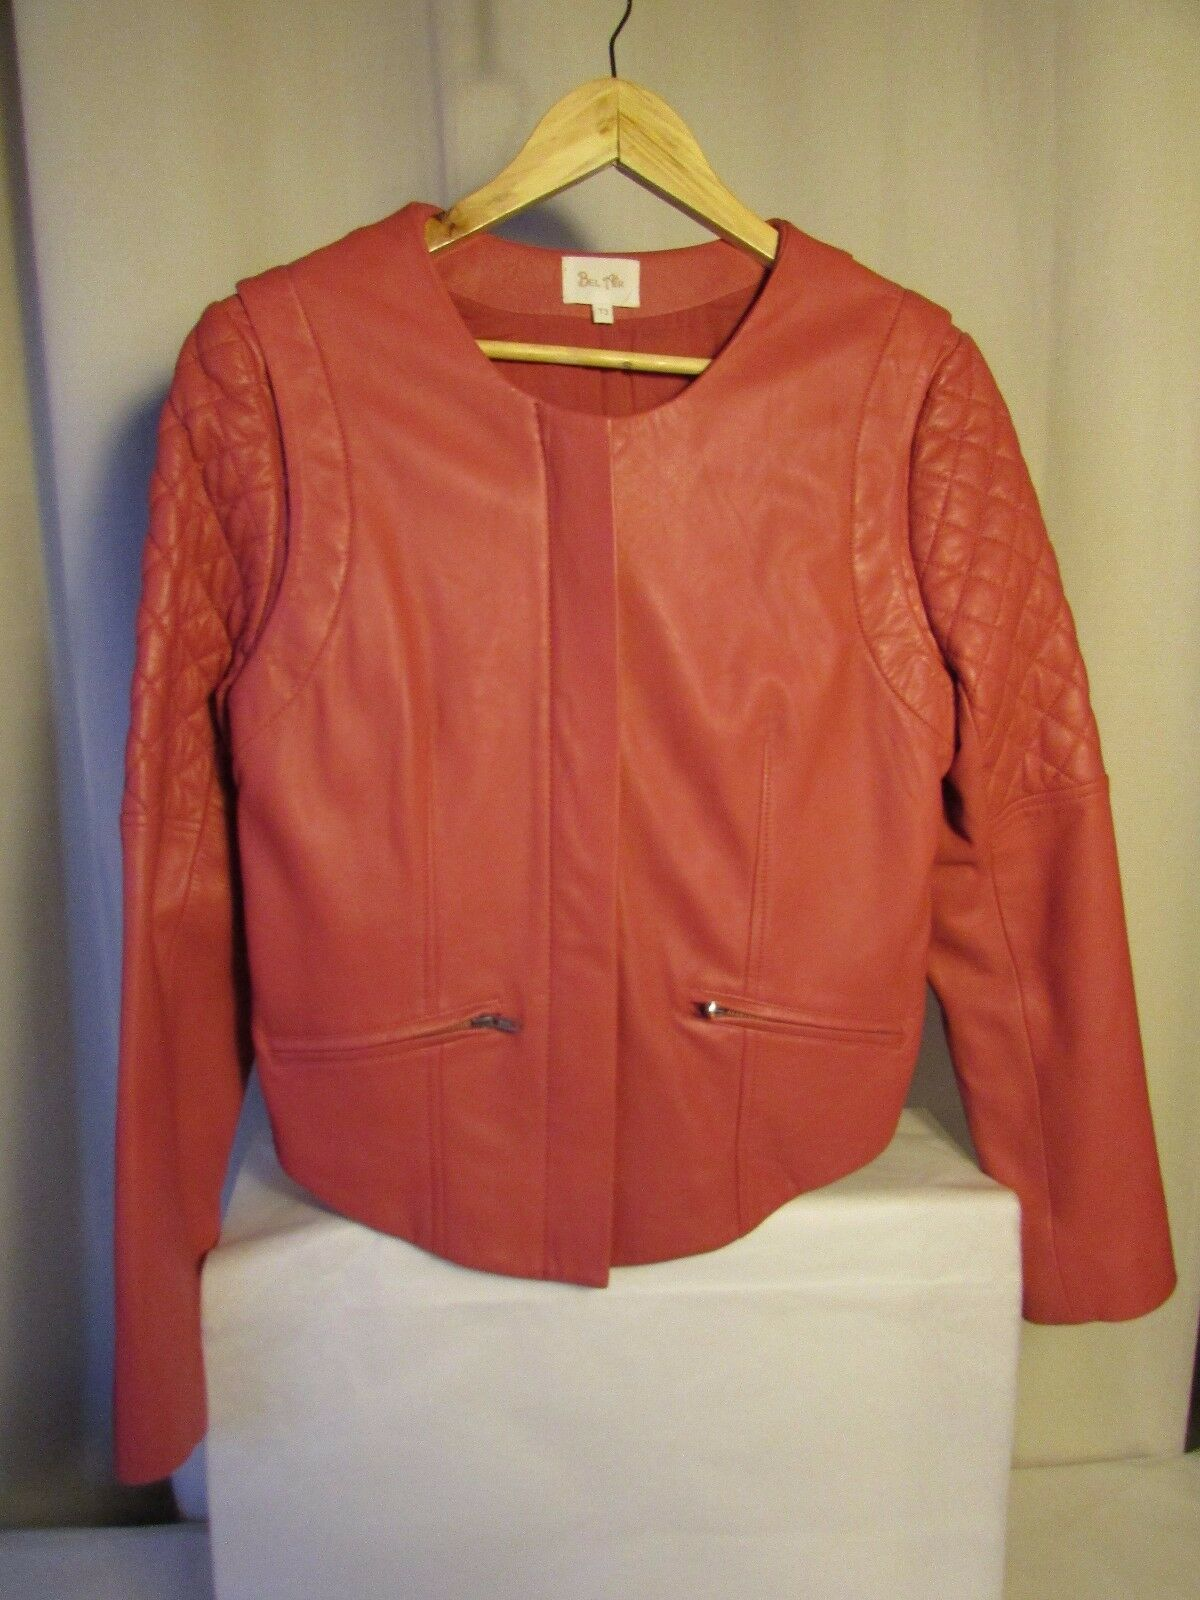 Blouson BEL AIR cuir pink size 3